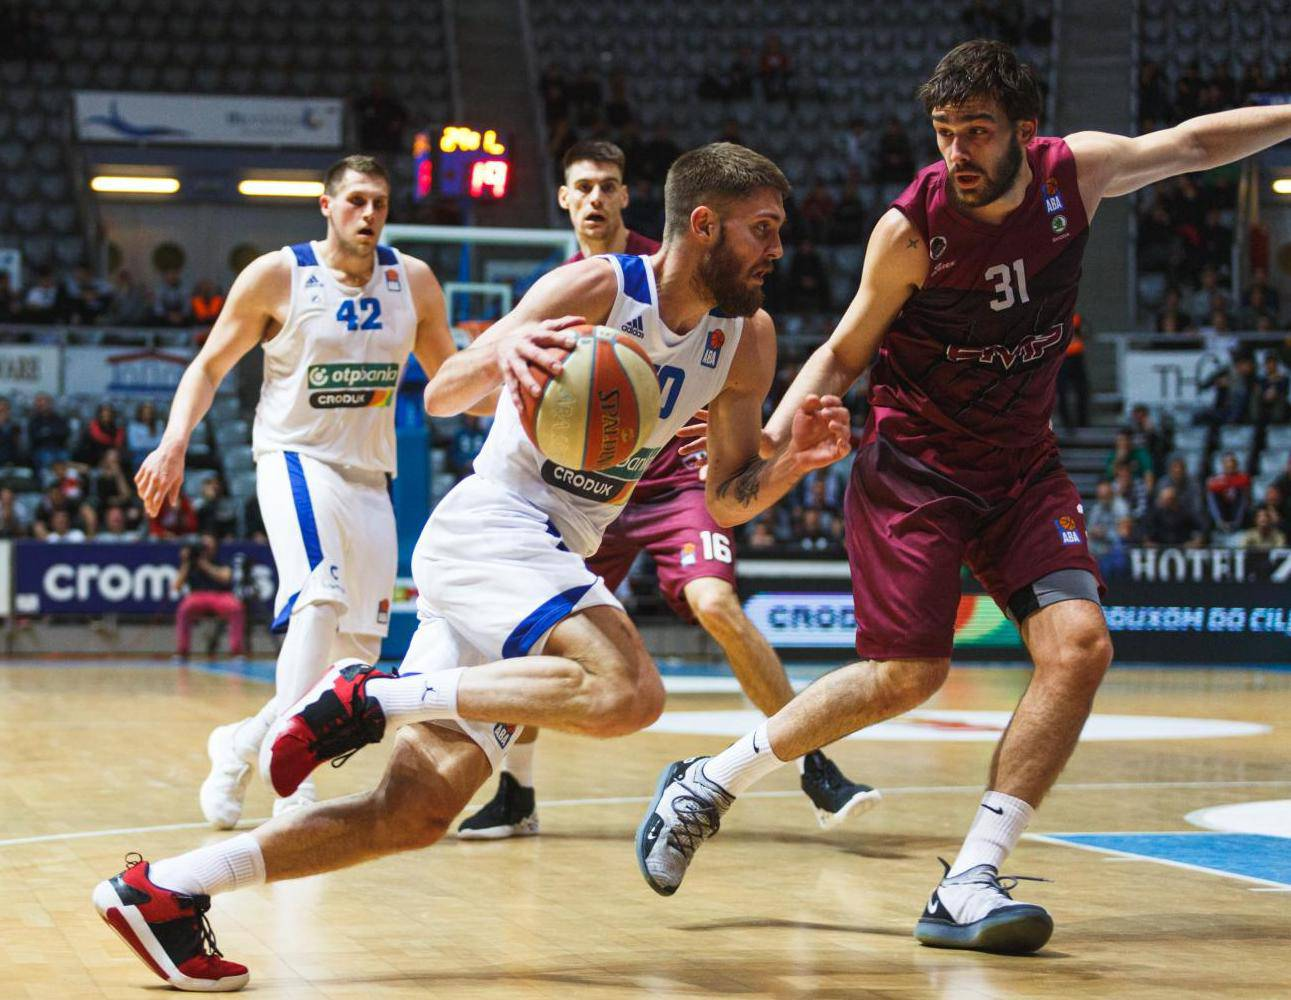 Zadar: Poništite prvenstvo, ne želimo titulu osvojiti za stolom